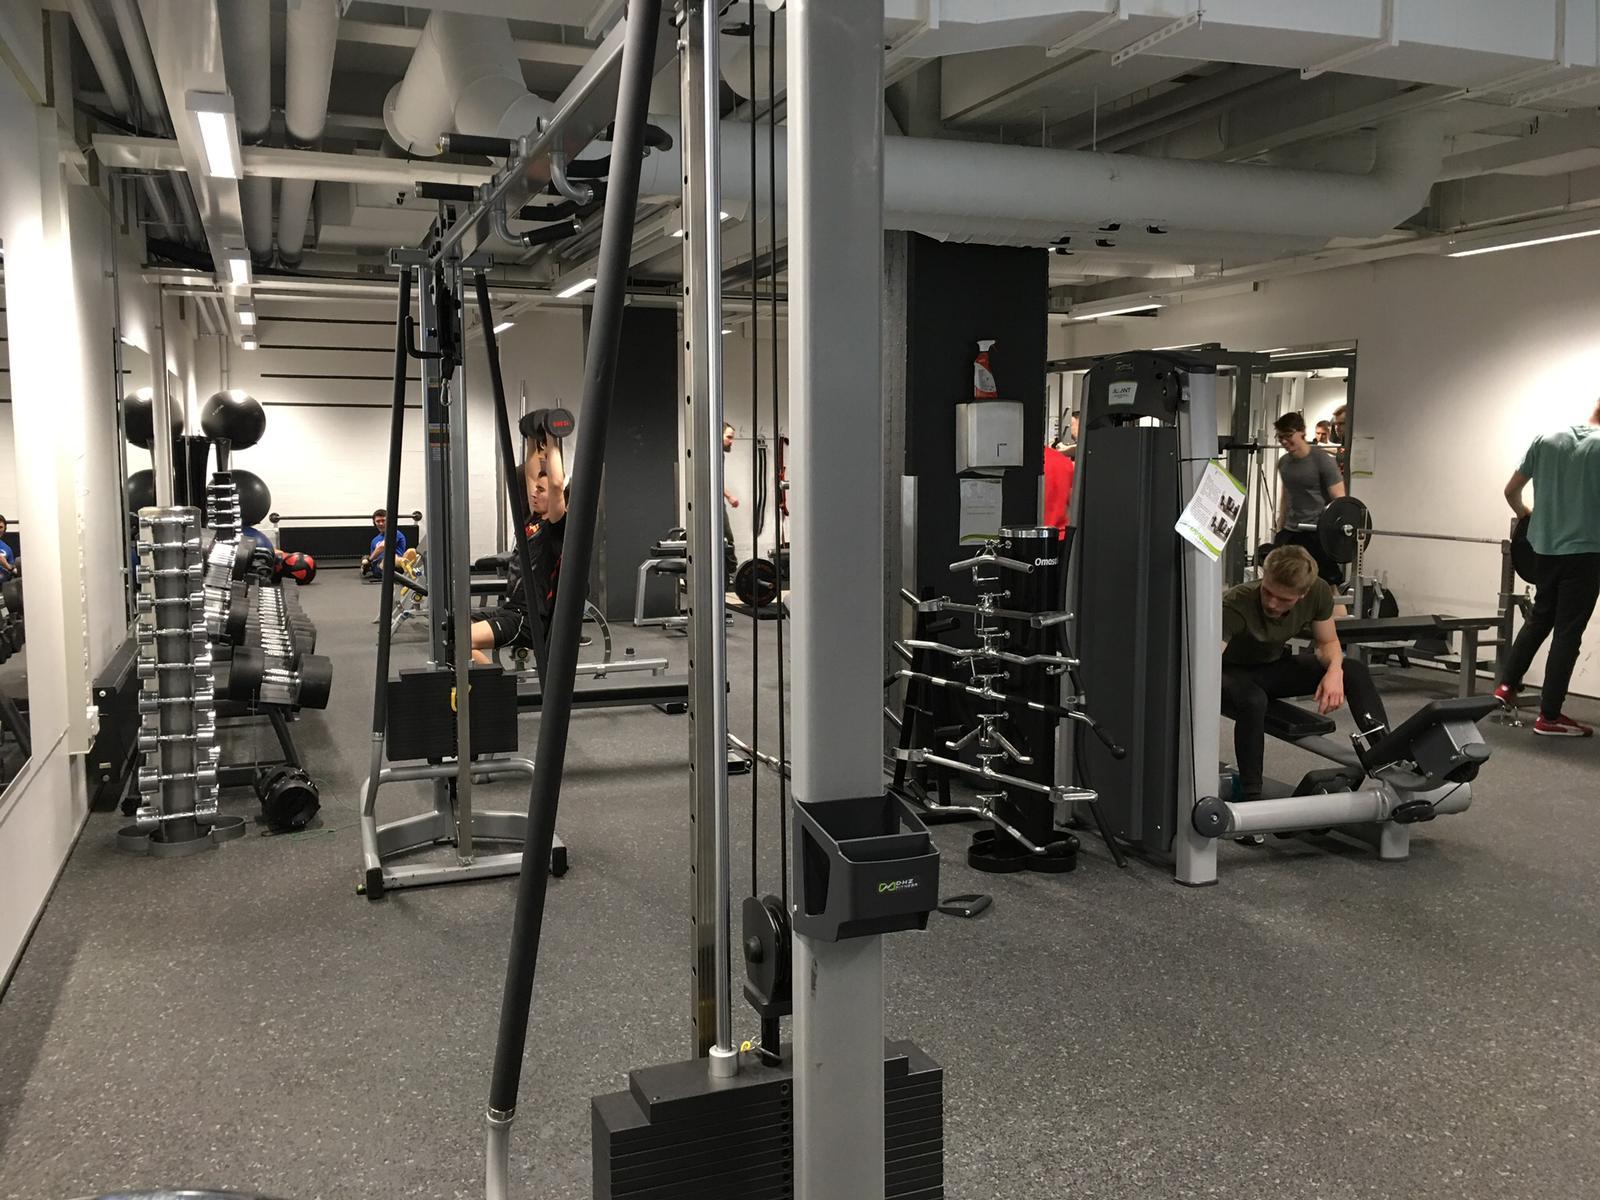 Liikuntamahdollisuudet Lappeenrannassa ja Skinnarilan kampuksella